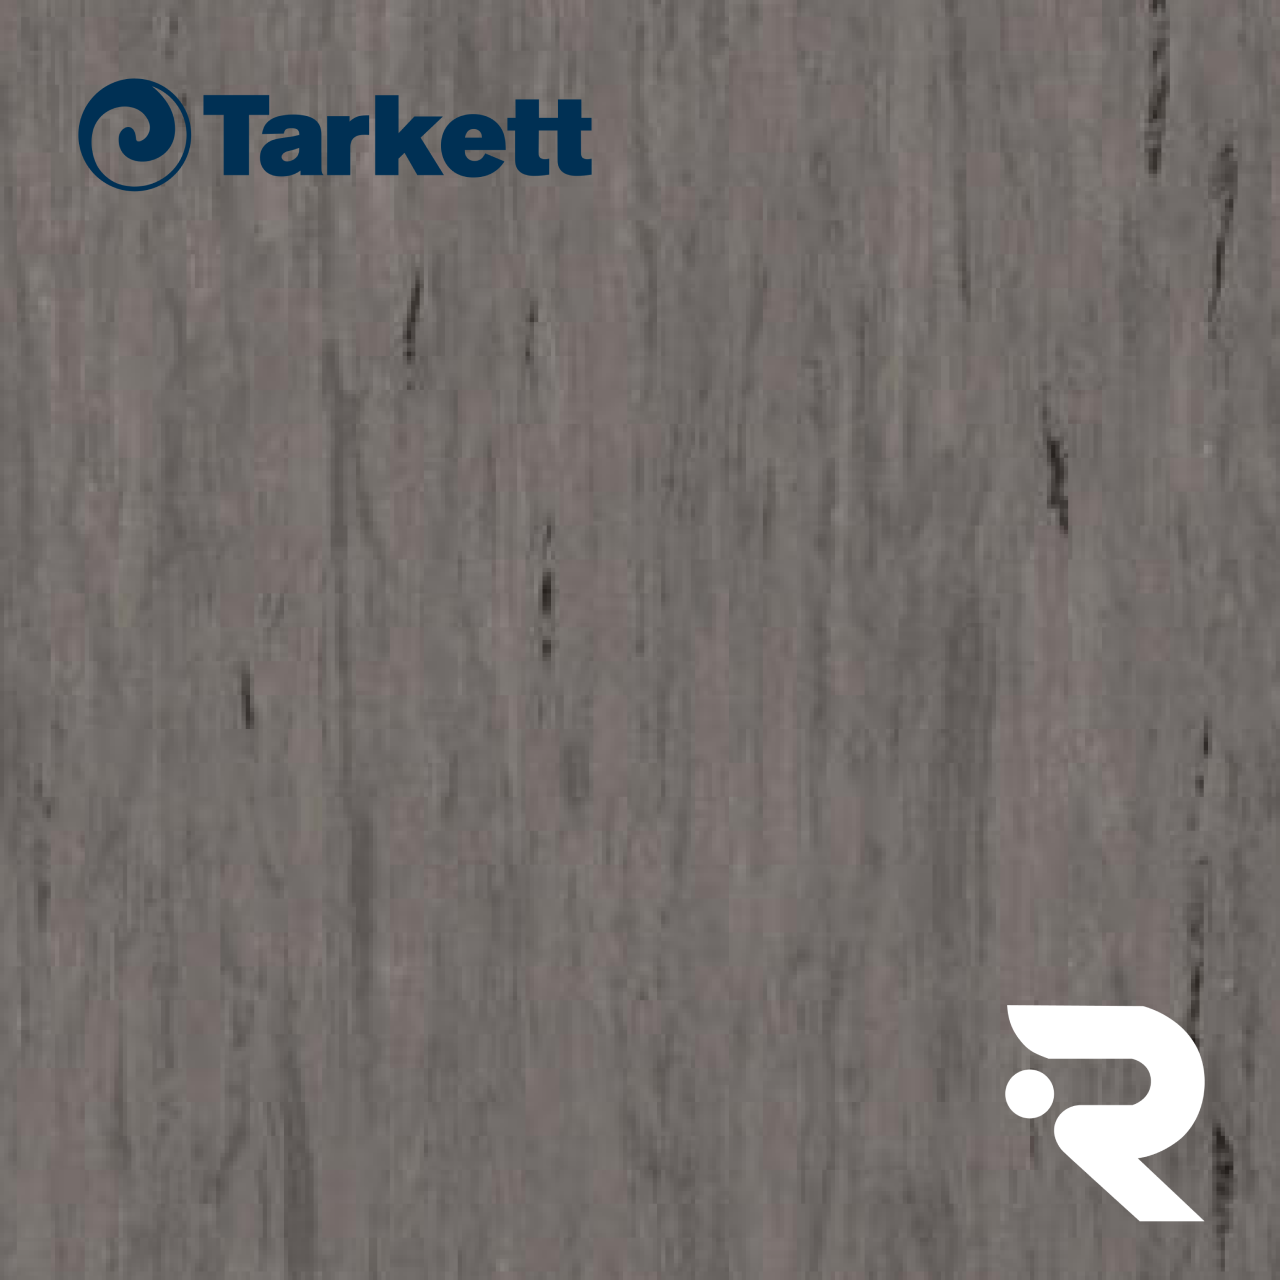 🏫 Гомогенный линолеум Tarkett | Standard BROWN GREY 0496 | Standard Plus 2.0 mm | 2 х 23 м